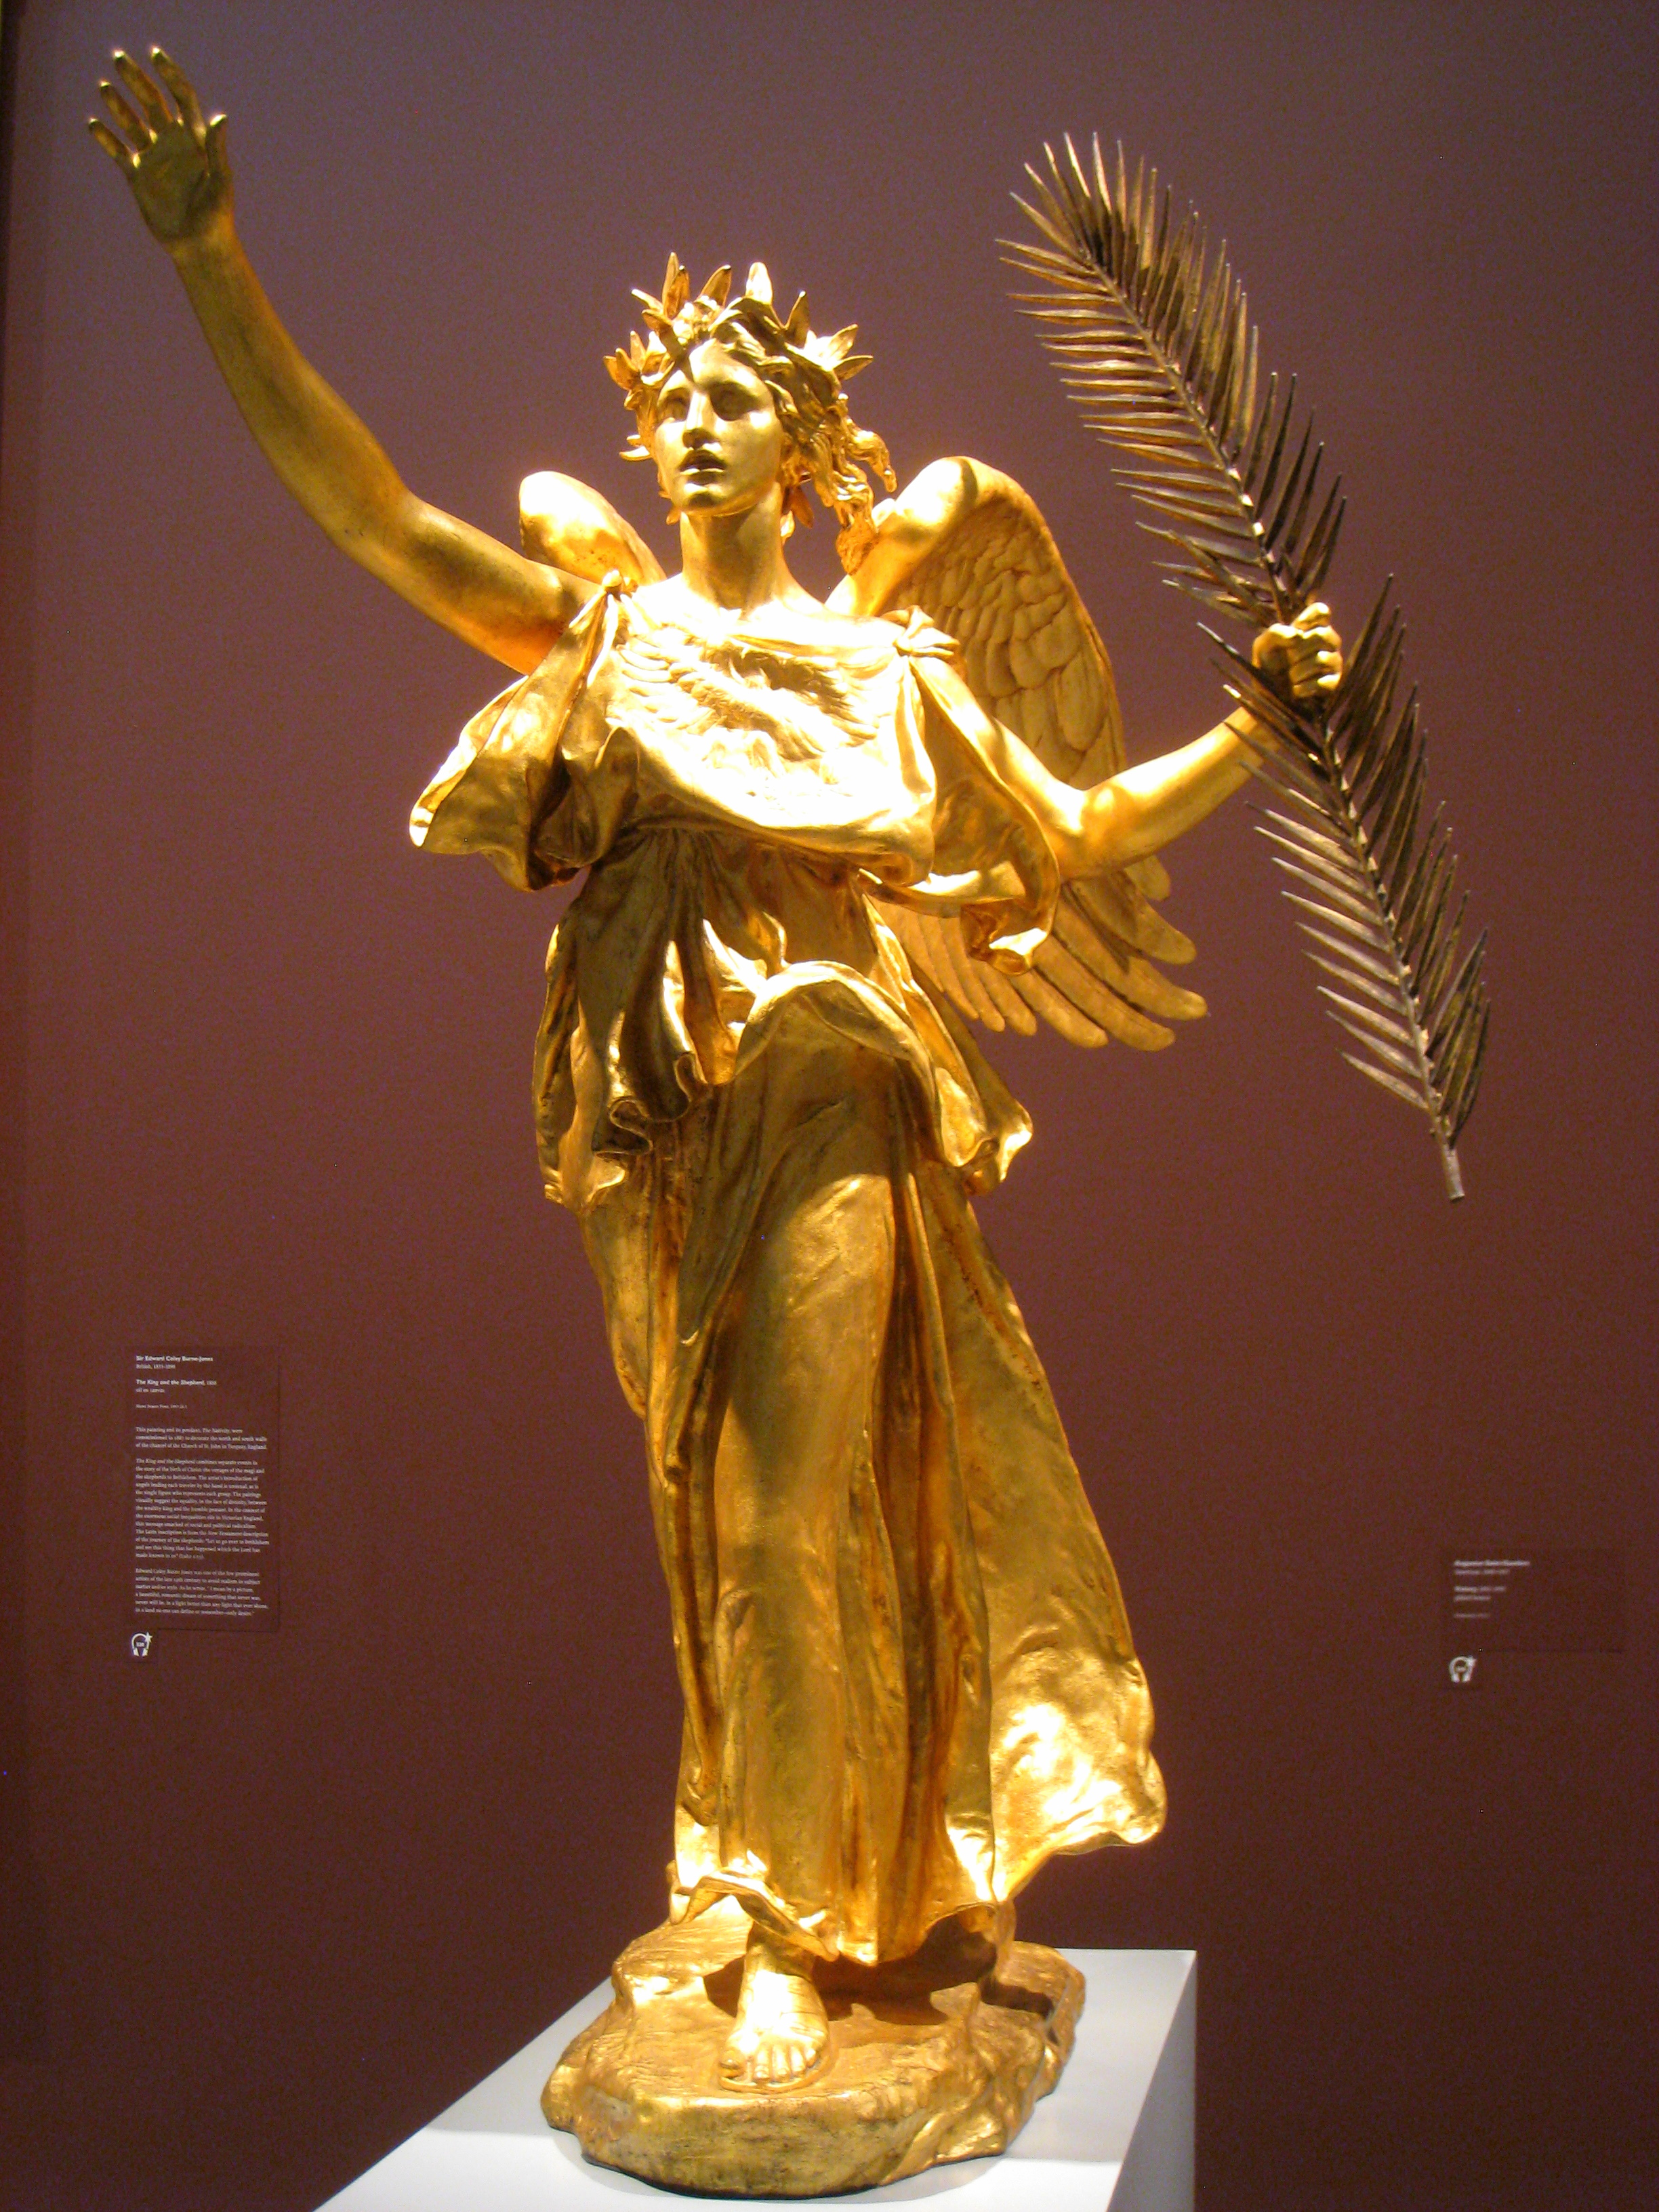 file augustus saint gaudens victory 1892 1903 img wikimedia commons. Black Bedroom Furniture Sets. Home Design Ideas